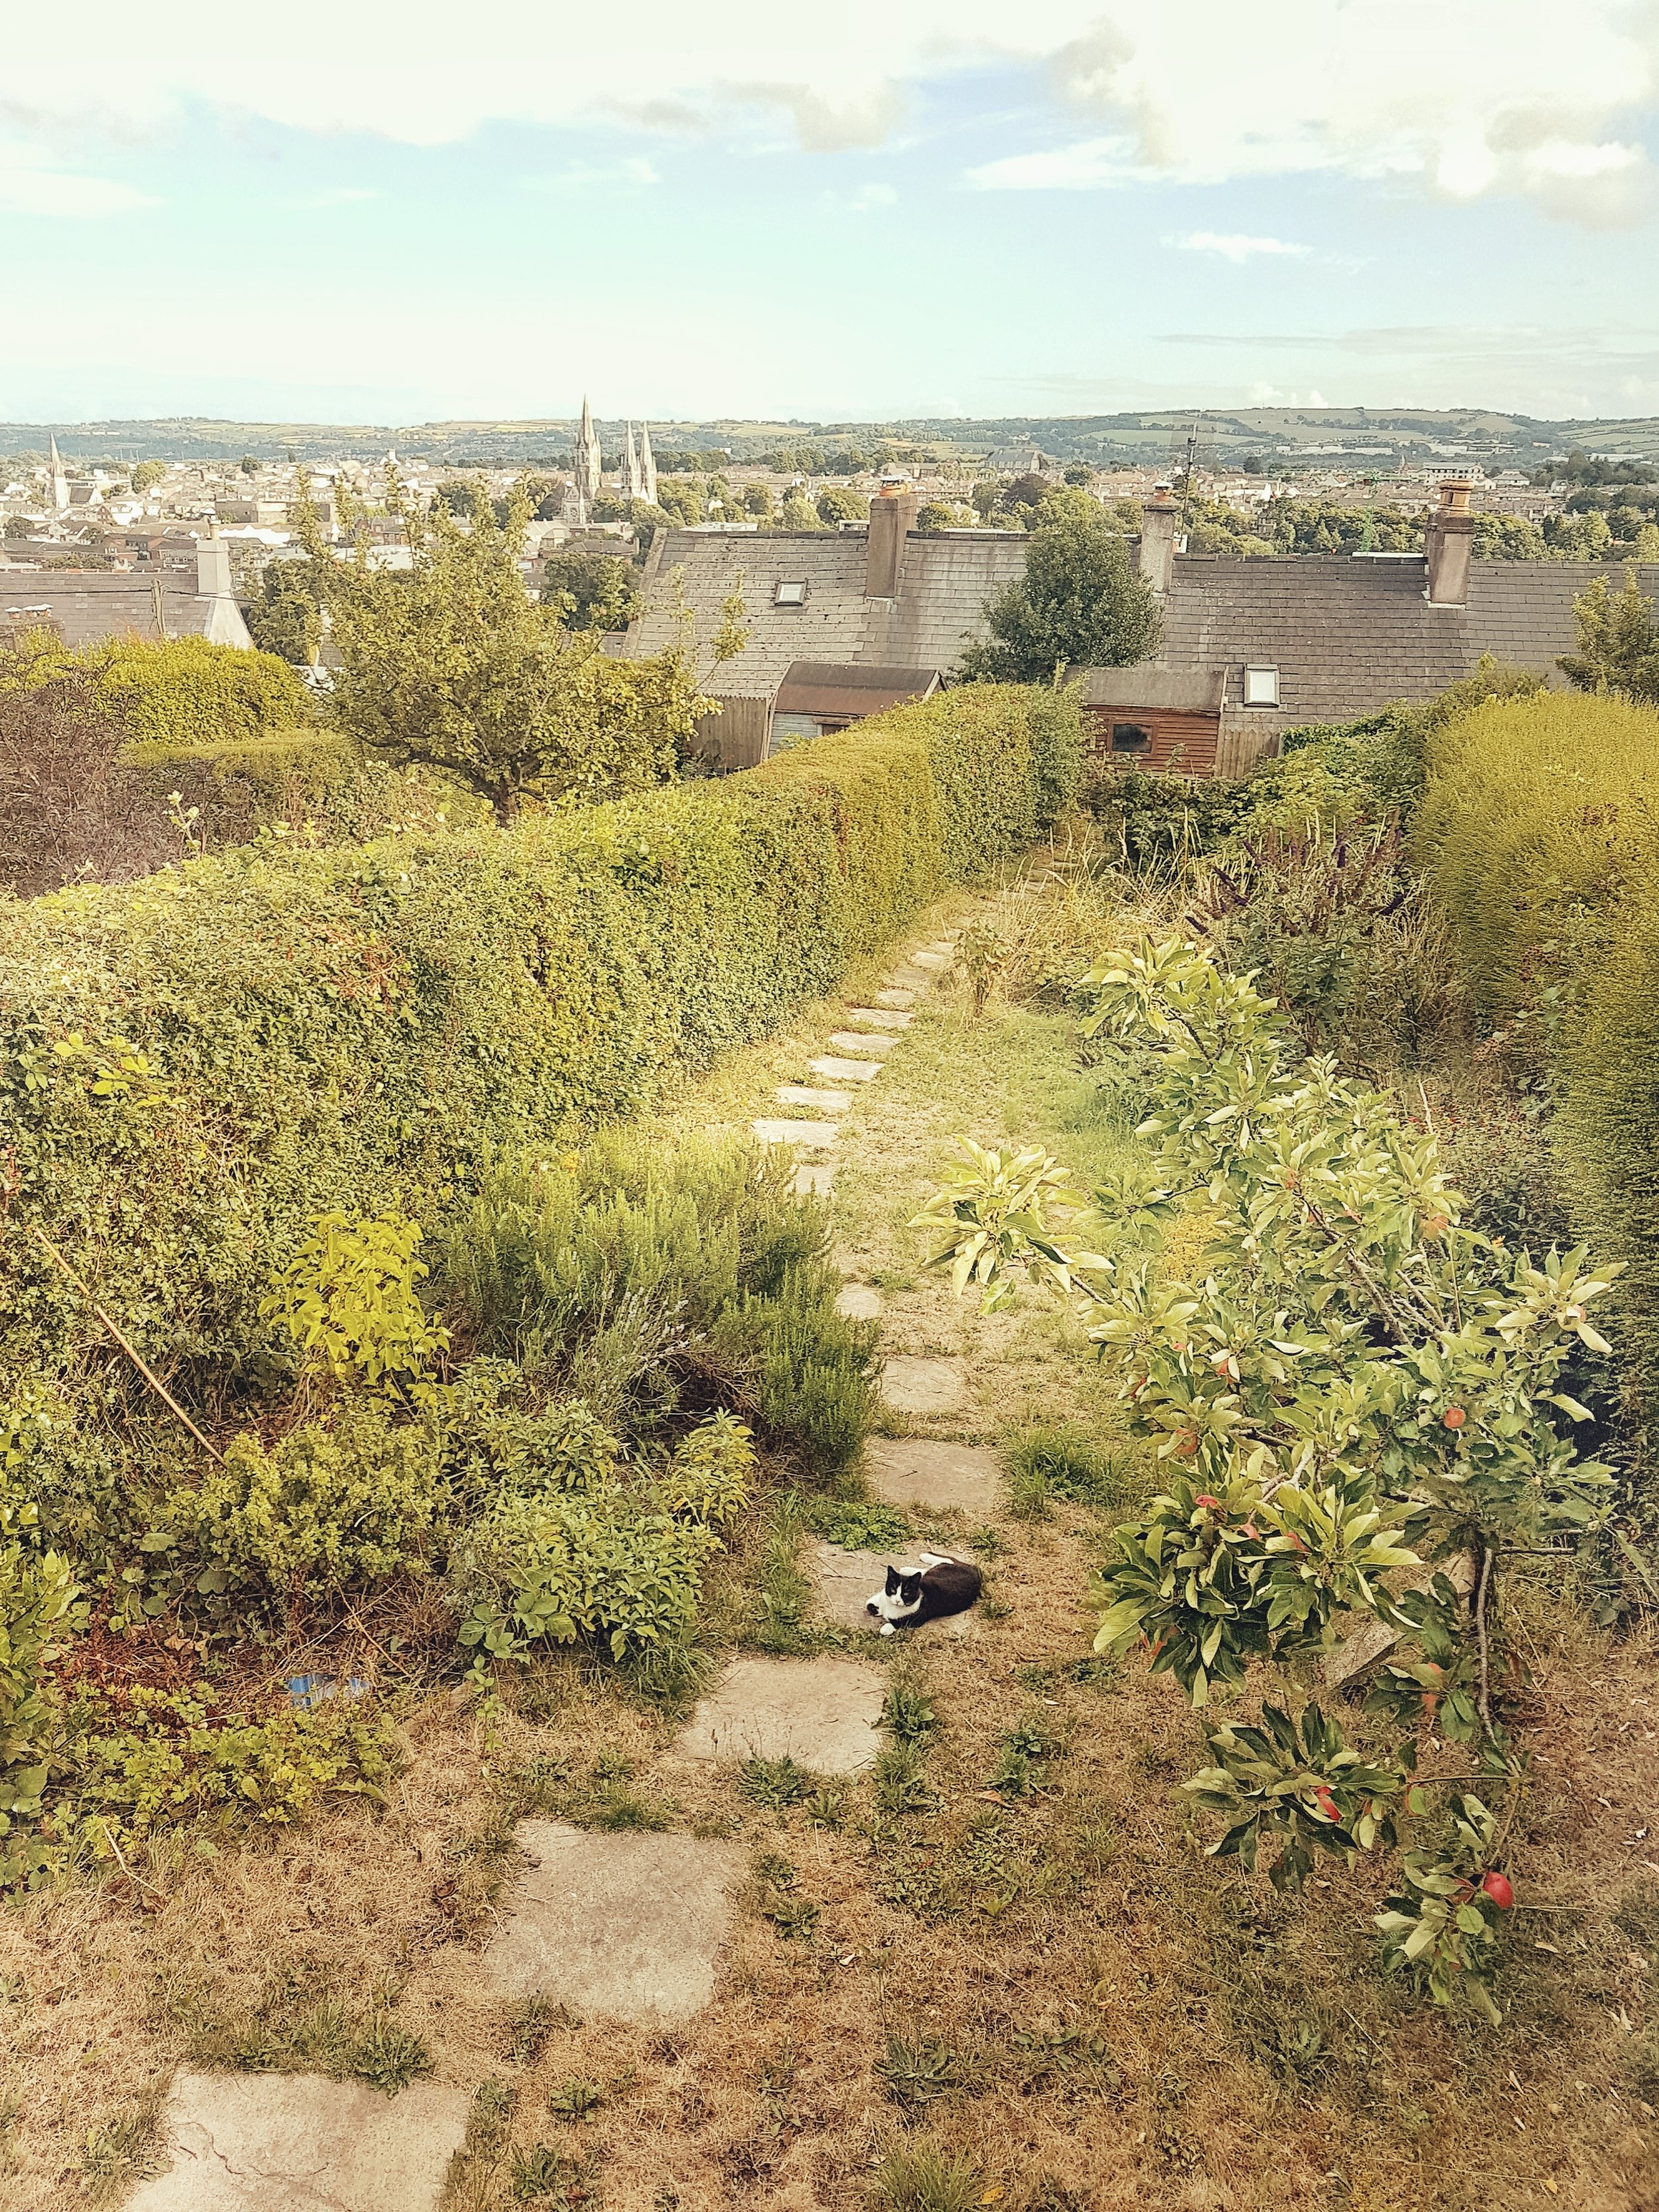 county cork. cork. ireland. irish. history. city. house sitting. old. travel. travel photography. travel photographer.  cat sitting in the garden.jpg